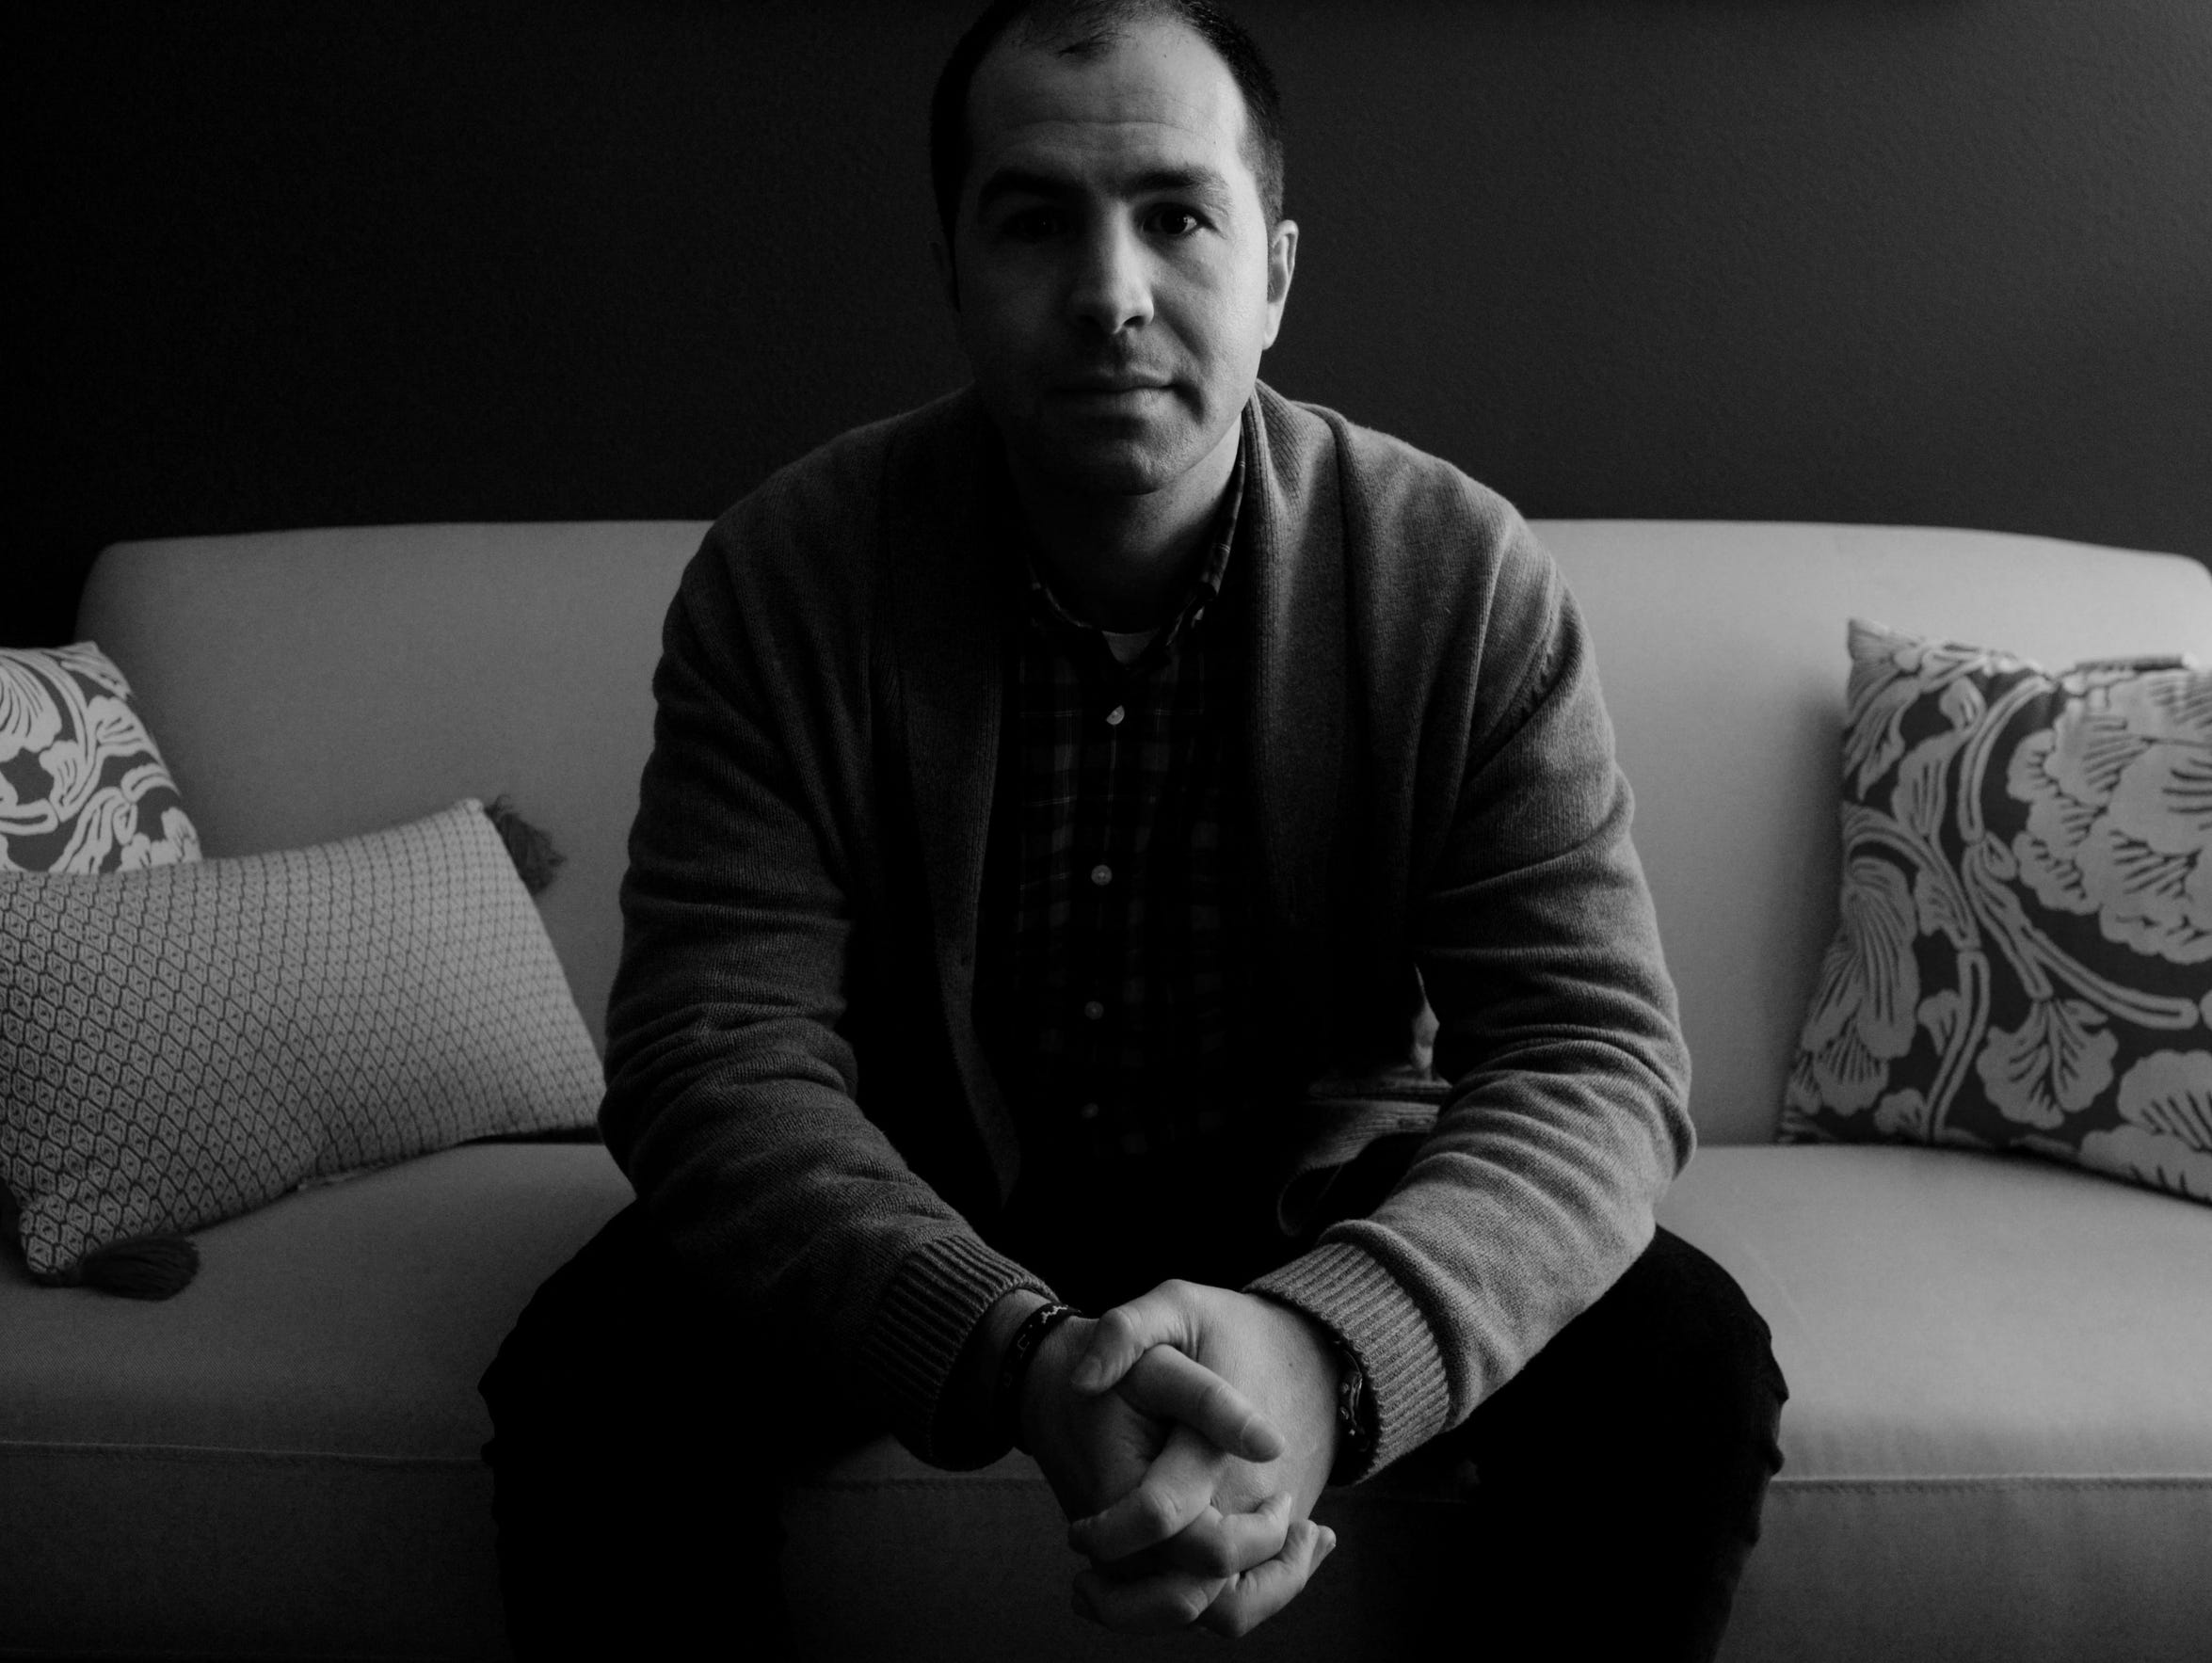 Clint Davis, a certified sex addiction therapist in